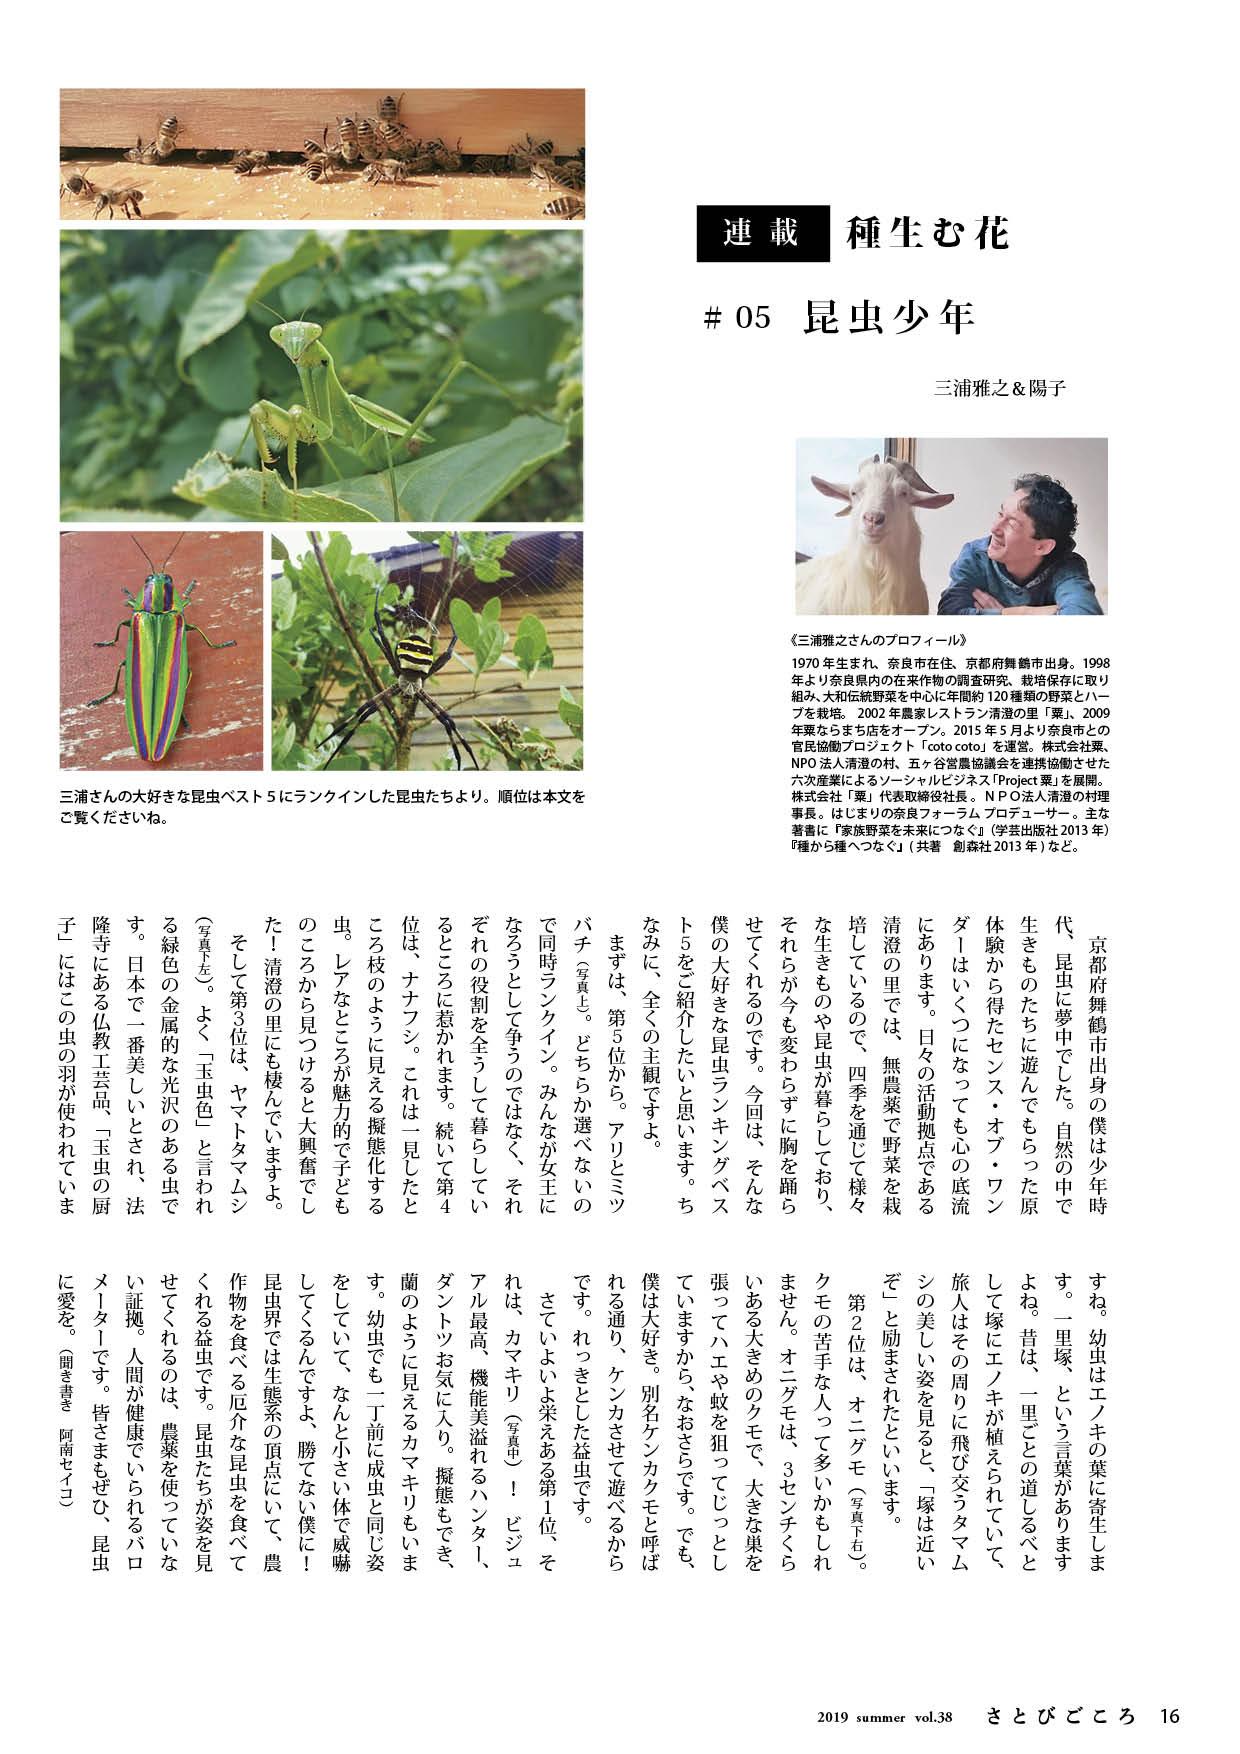 vol.38(2019summer)#05 昆虫少年